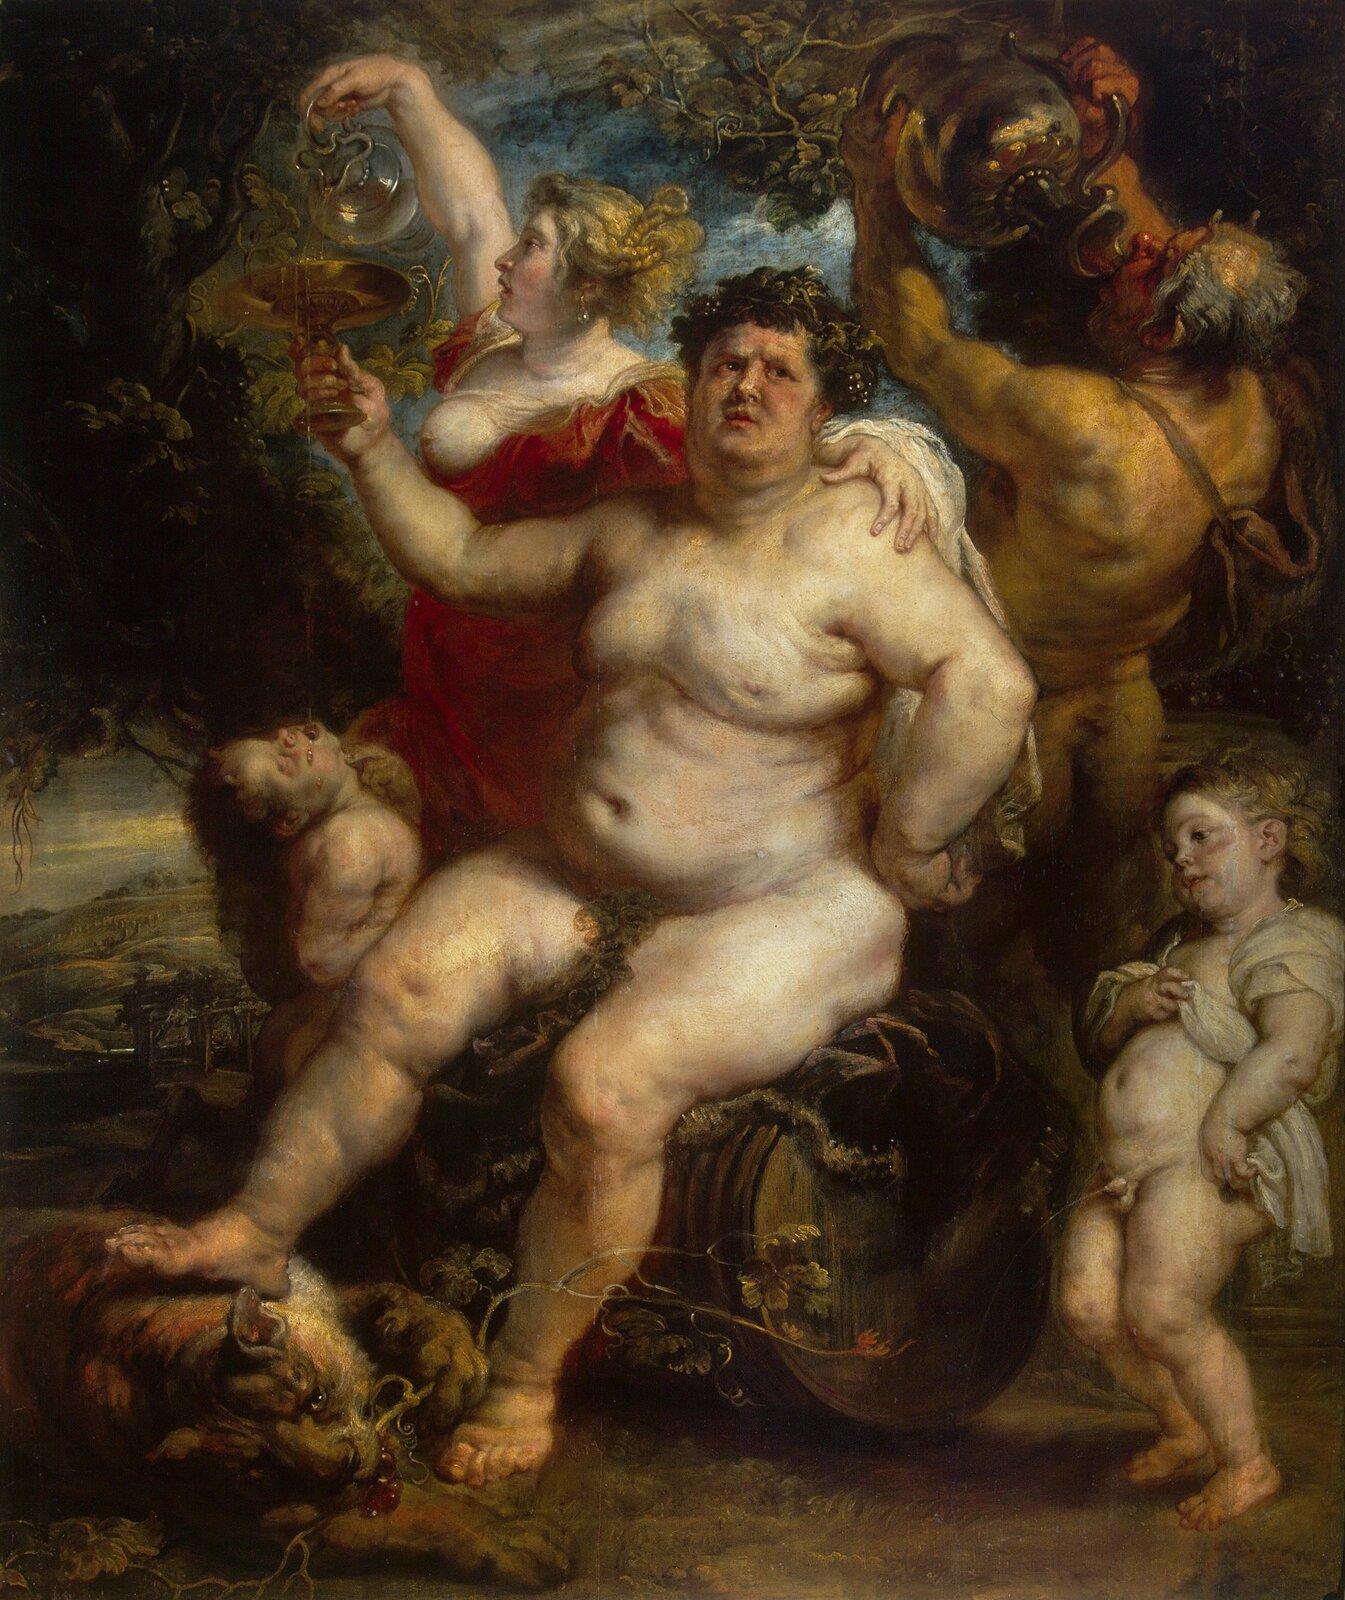 Bachus Źródło: Peter Paul Rubens, Bachus, ok. 1638–1640, olej na płótnie, Hermitage Museum, Sankt Petersburg, domena publiczna.